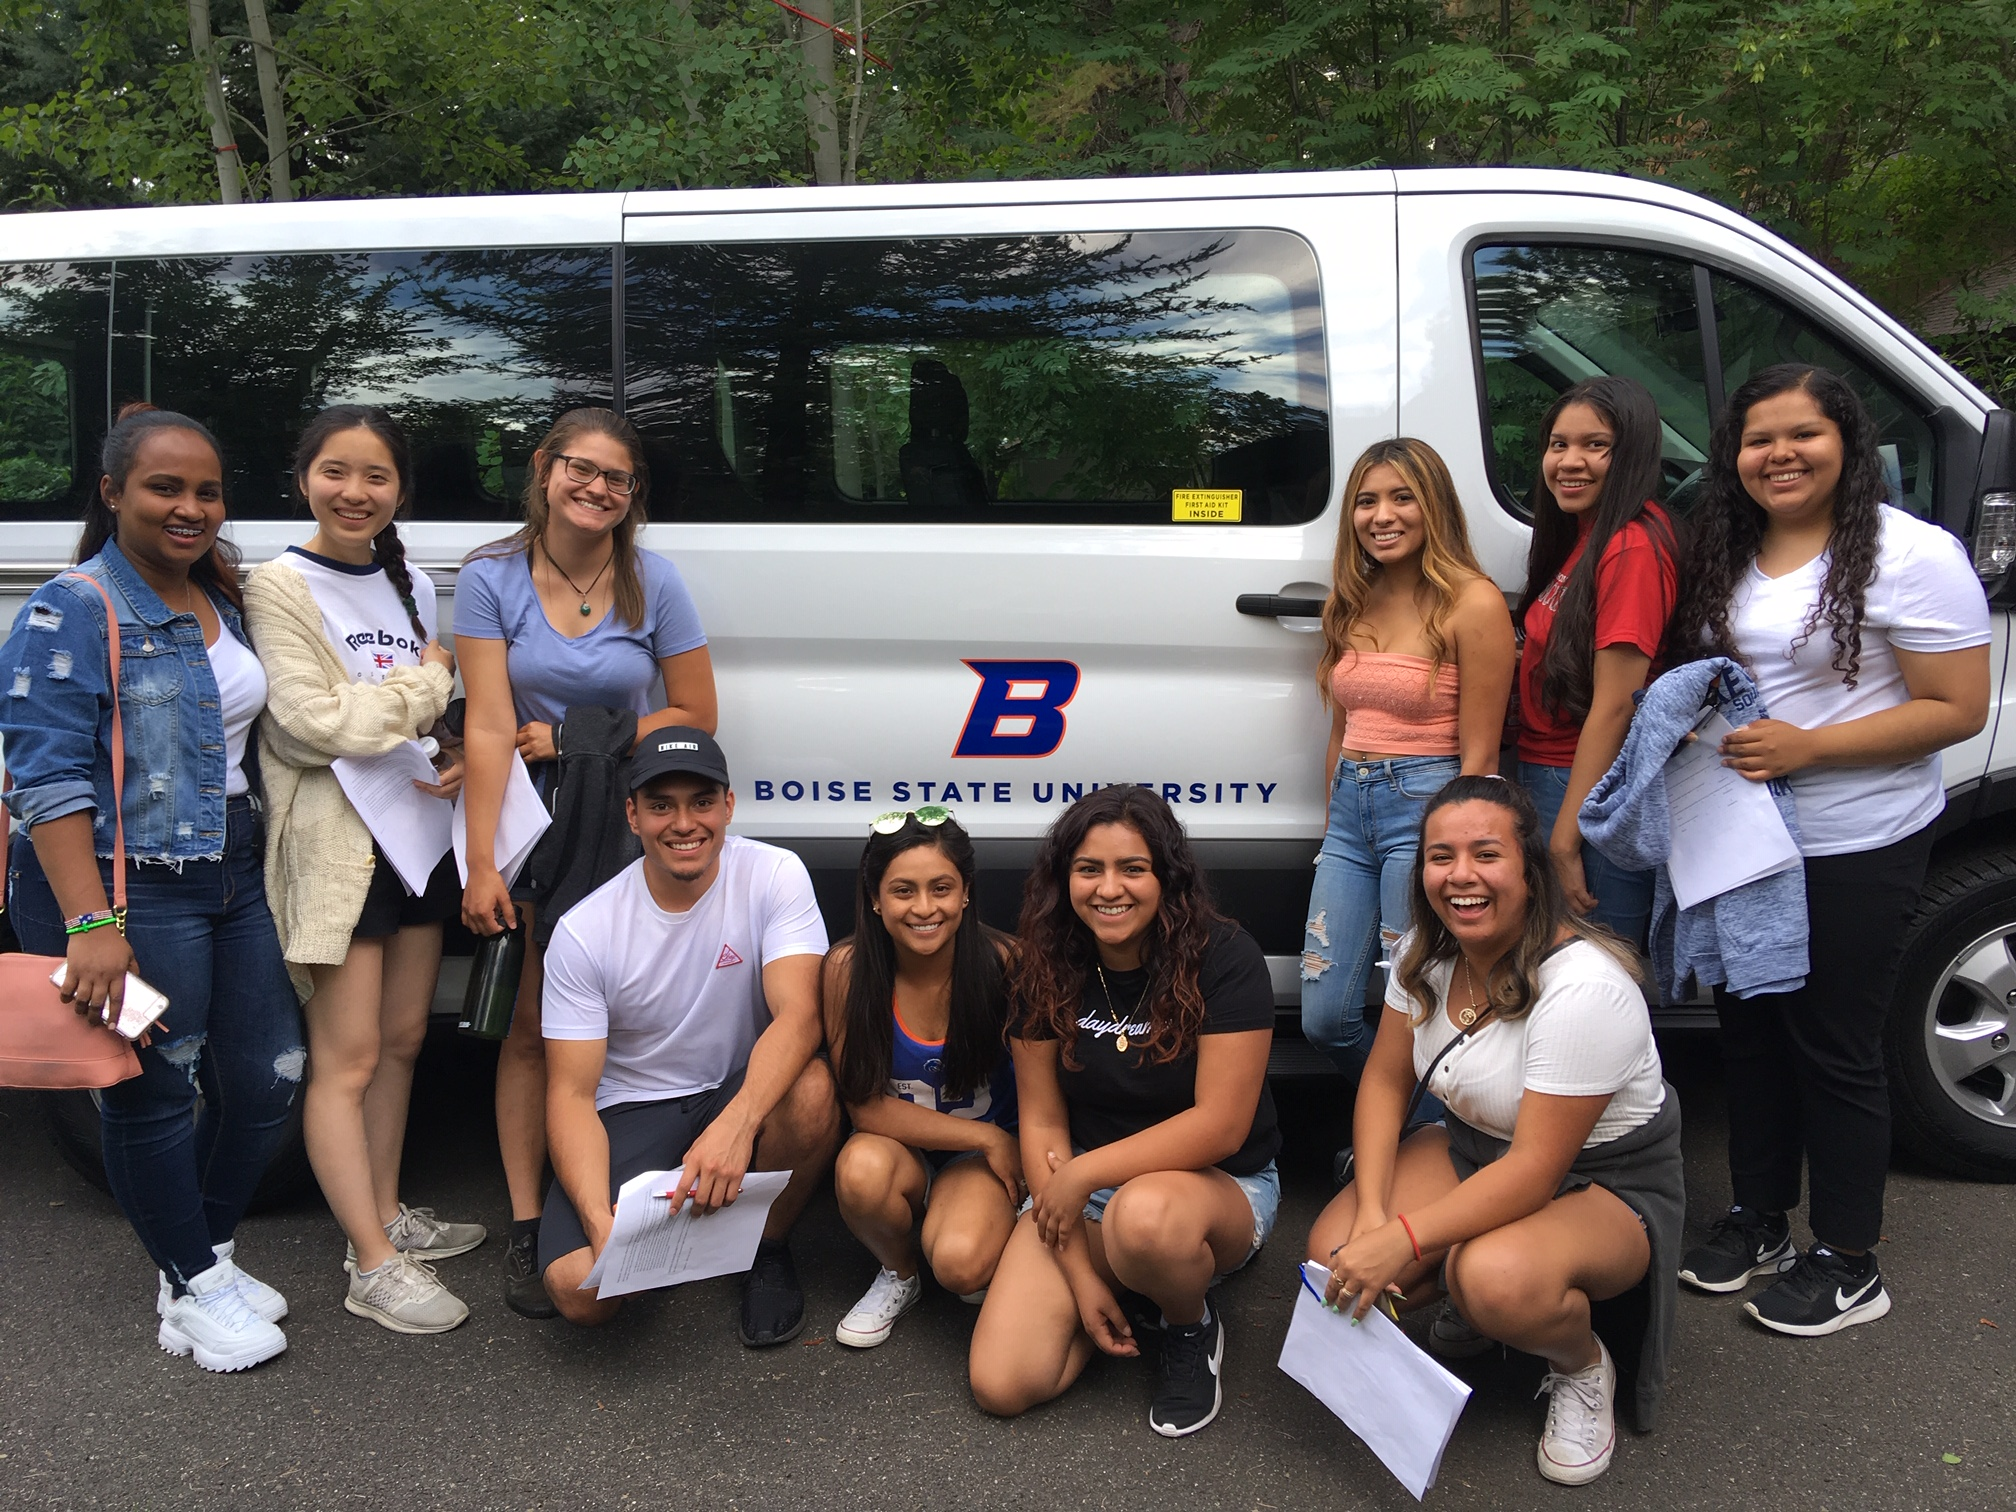 TRIO students pose near a van